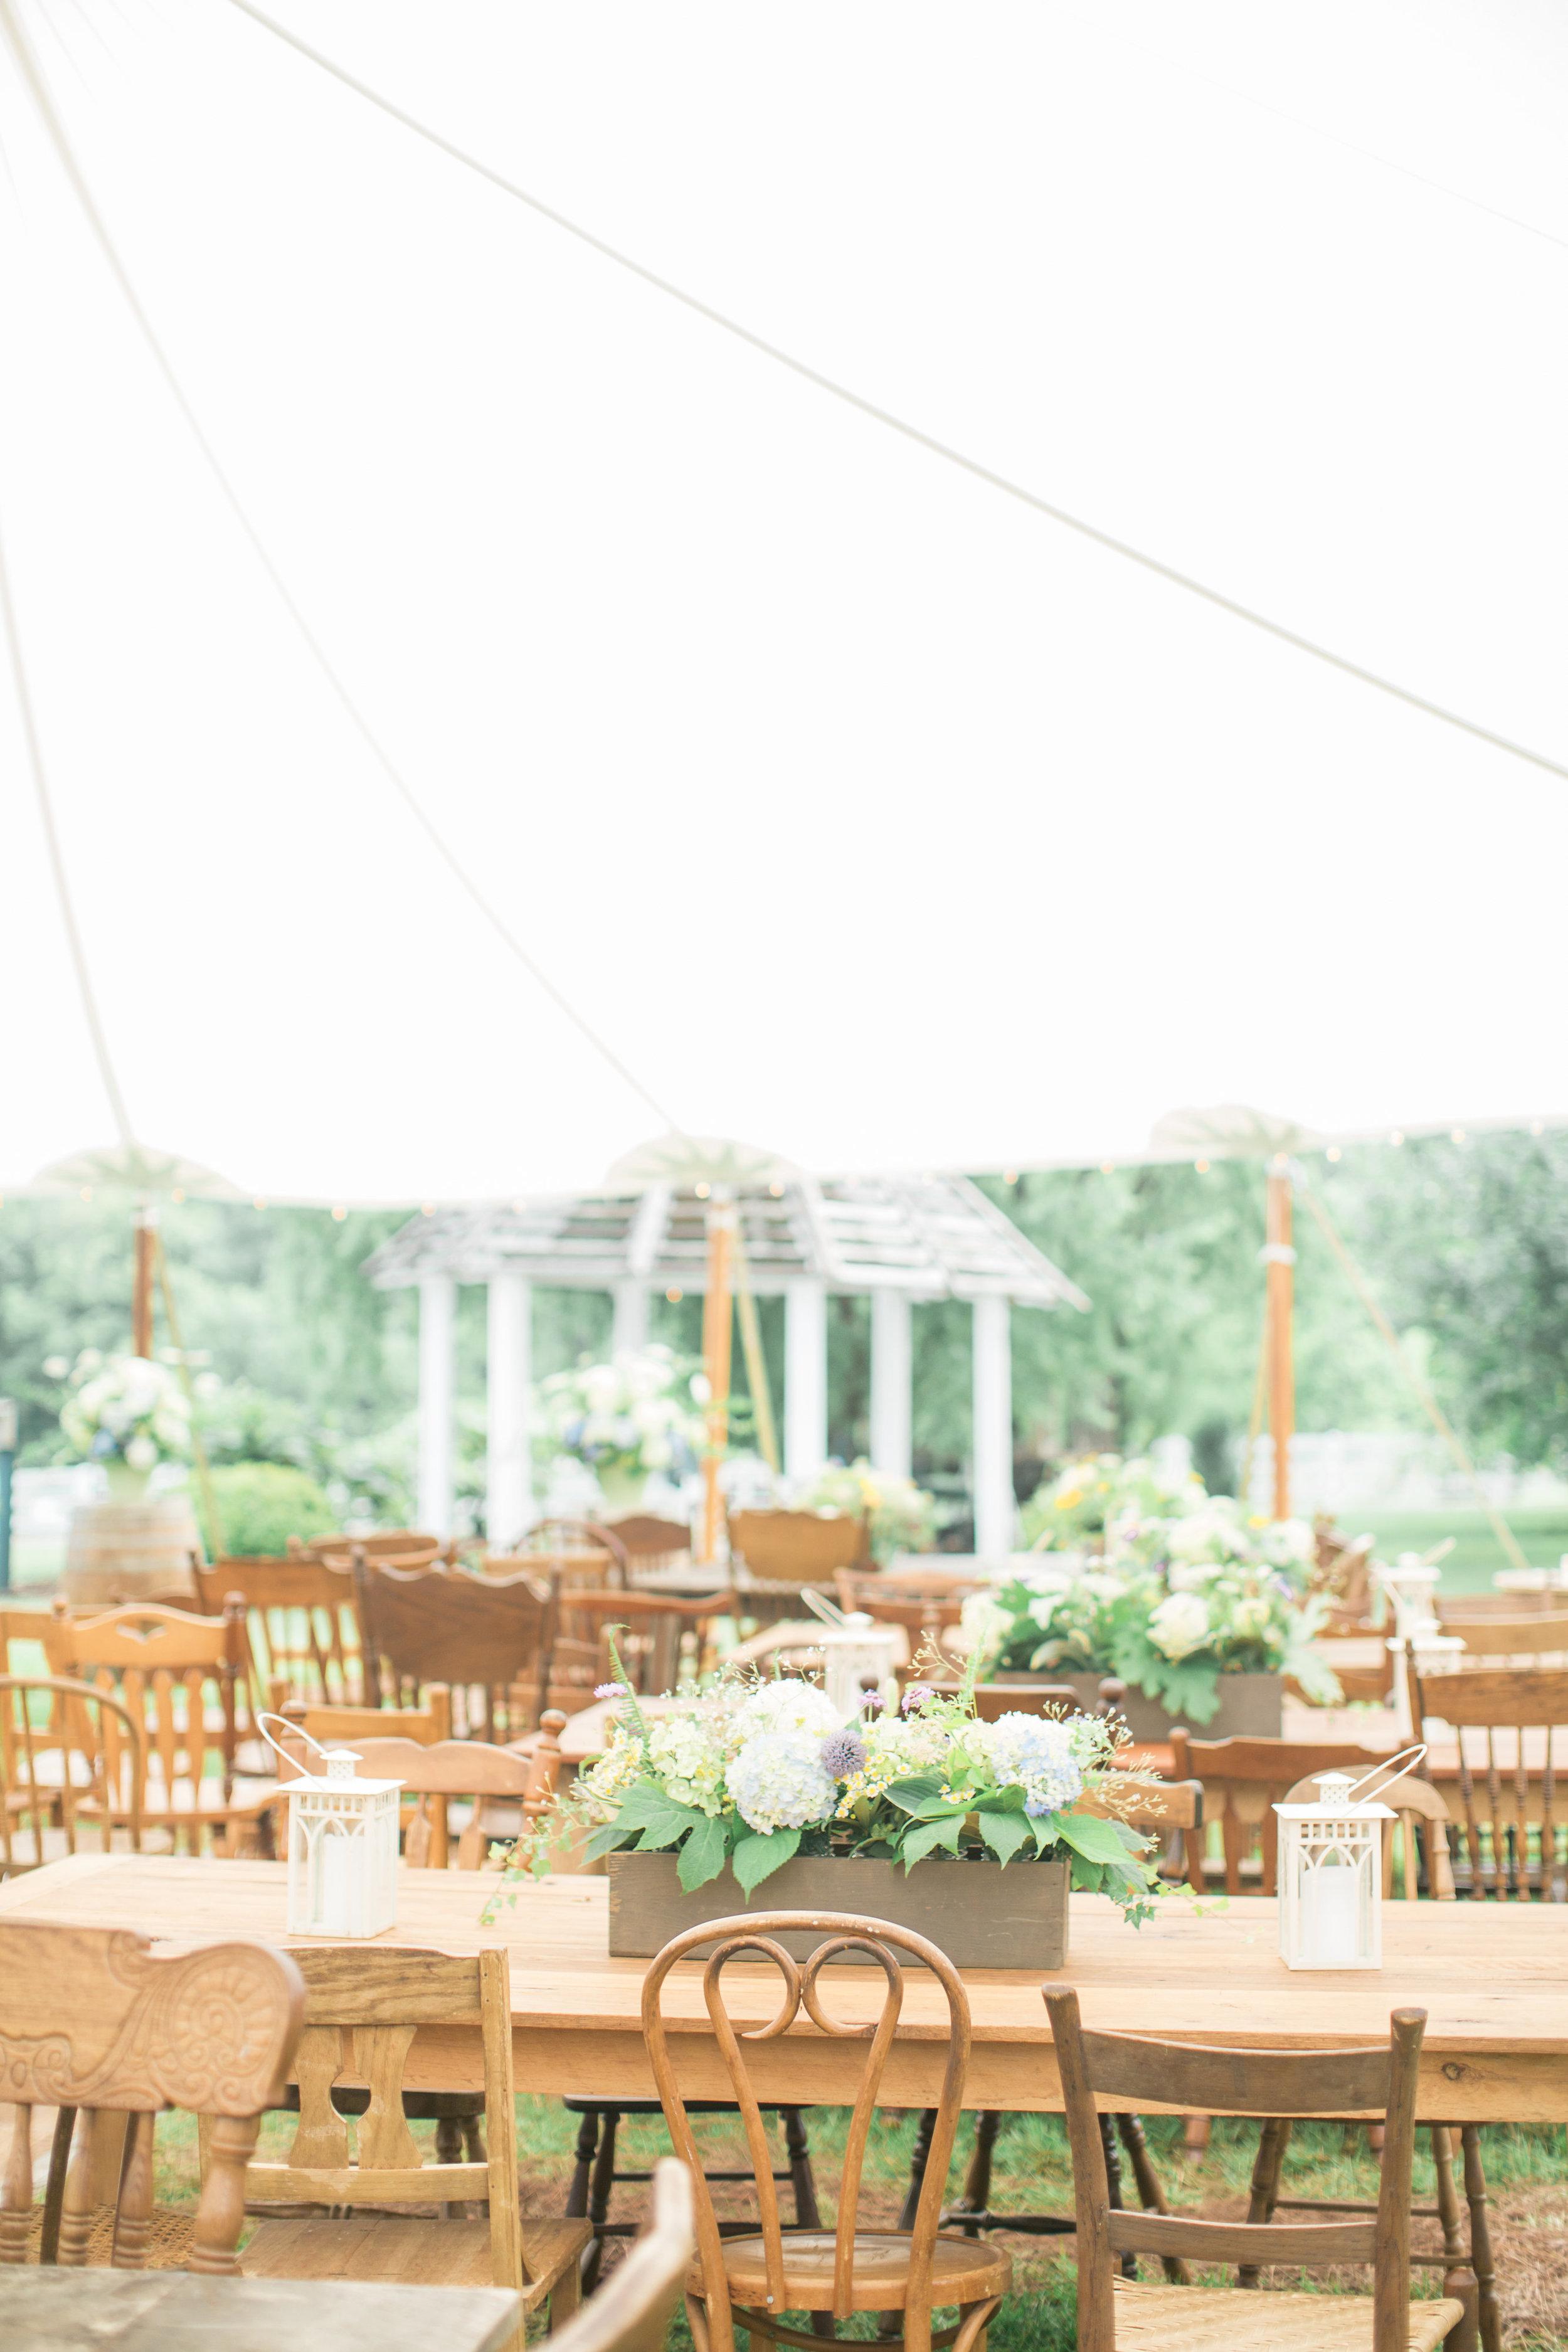 062715-Hannah+Drew-pharsalia-wedding-kathryn-ivy-photography-154.jpg